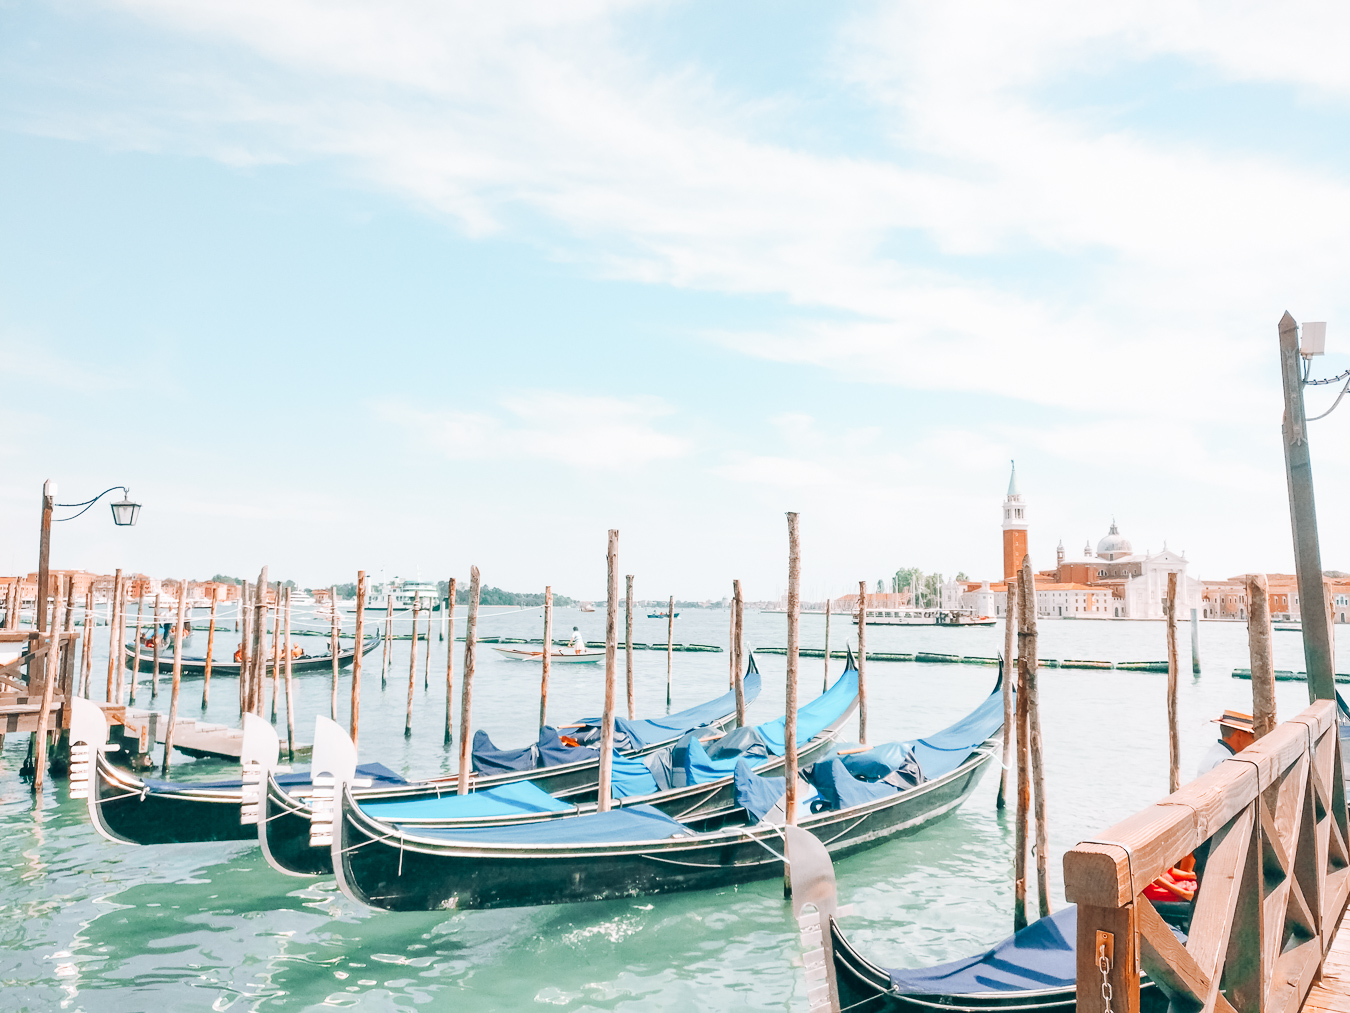 Gondolas in the beautiful city of Venice in Europe